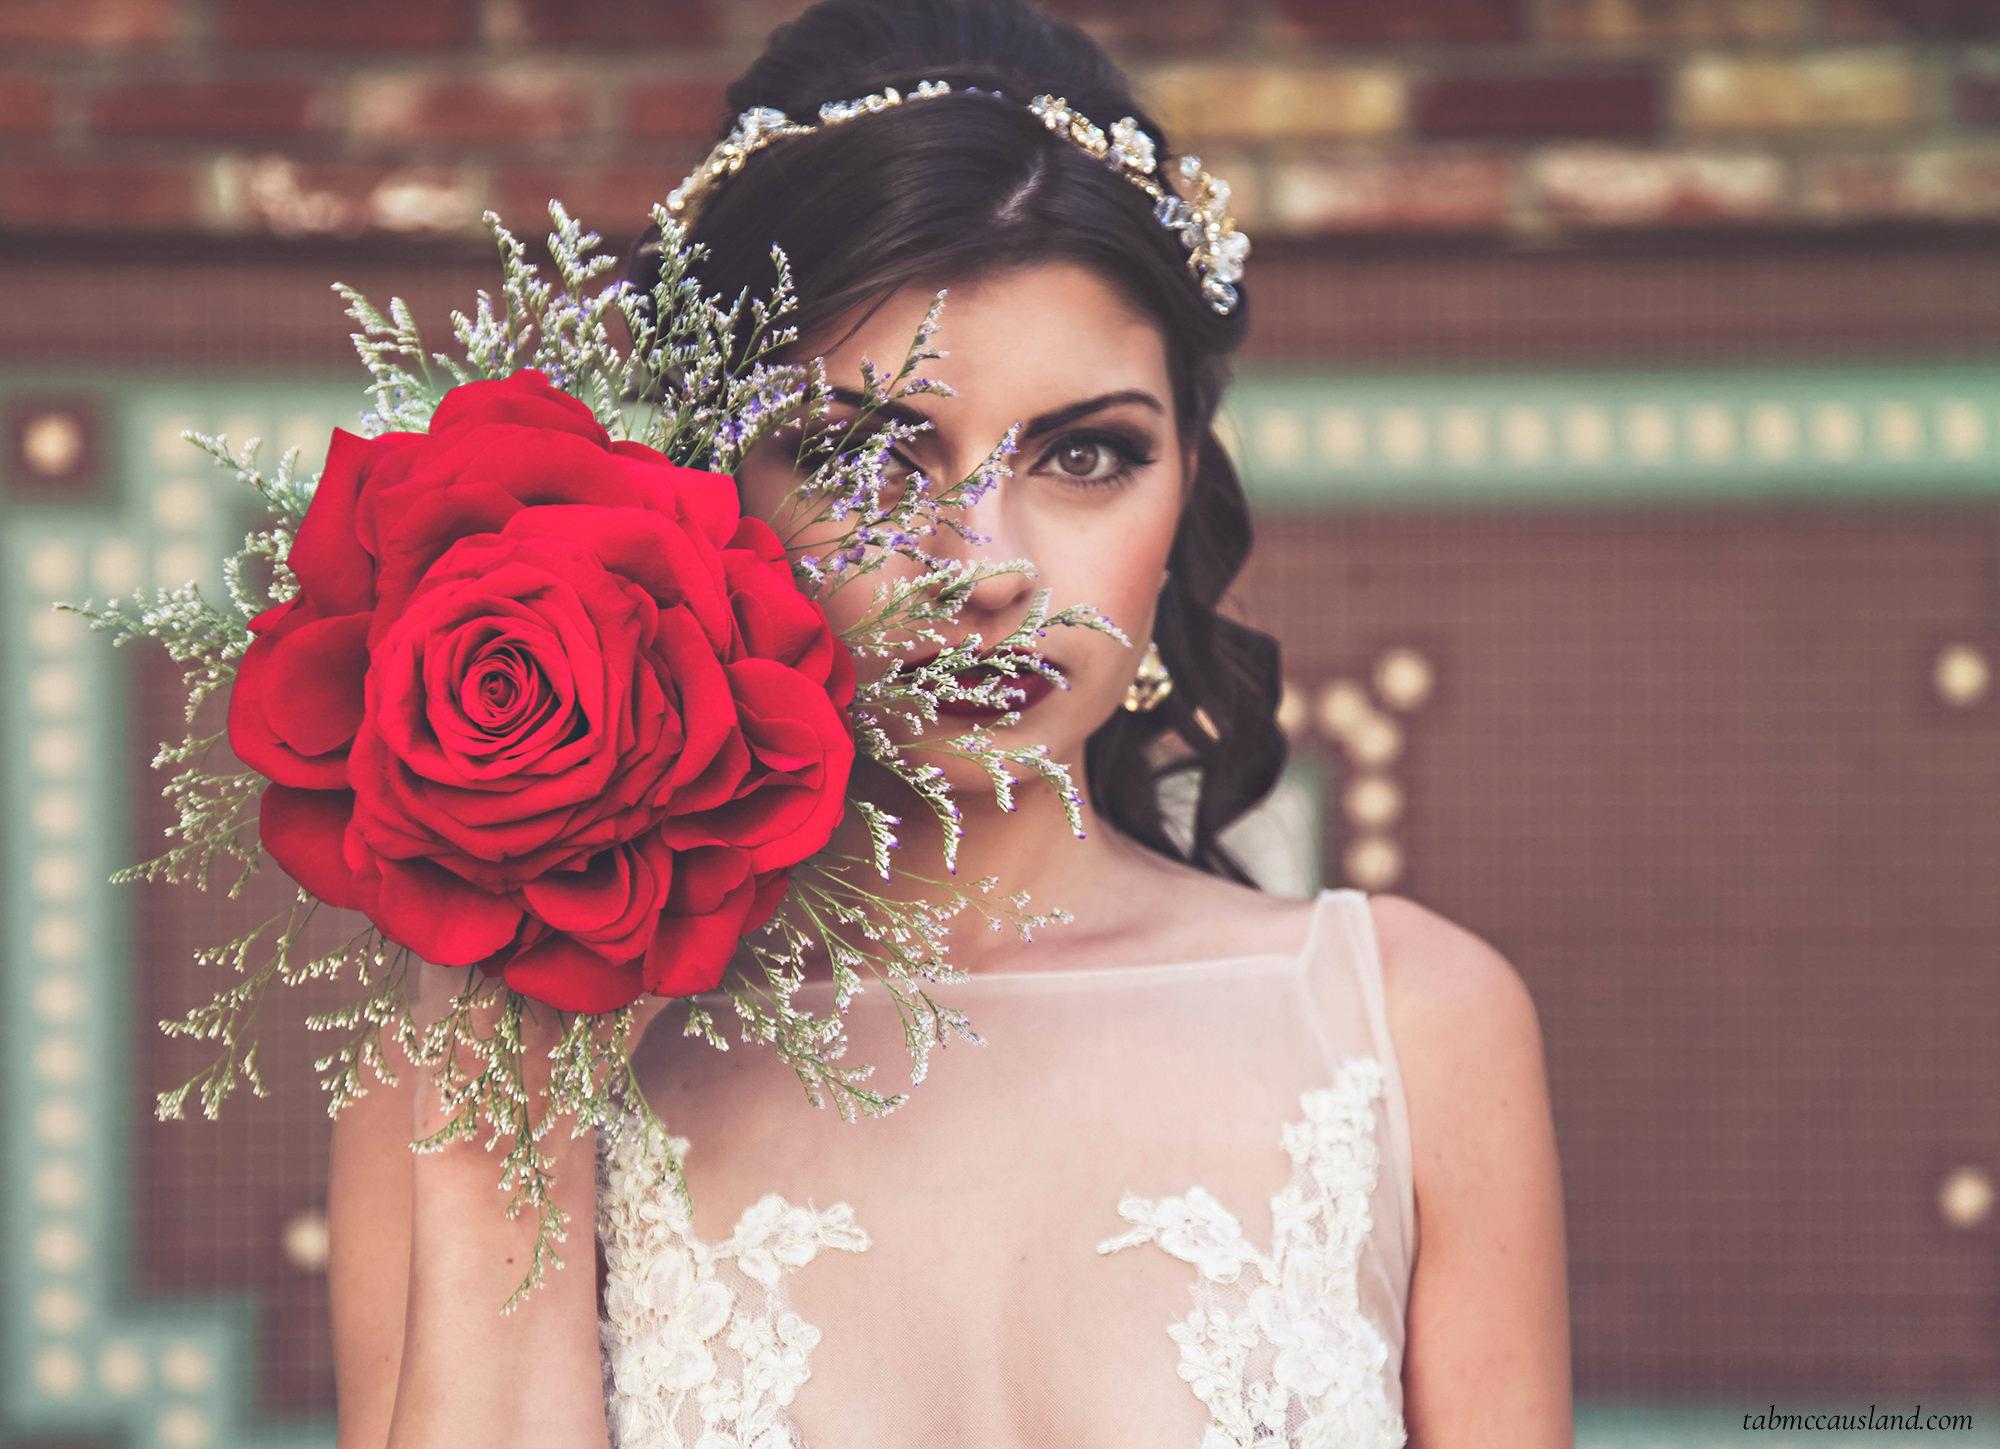 Wedding Flowers Red Rose